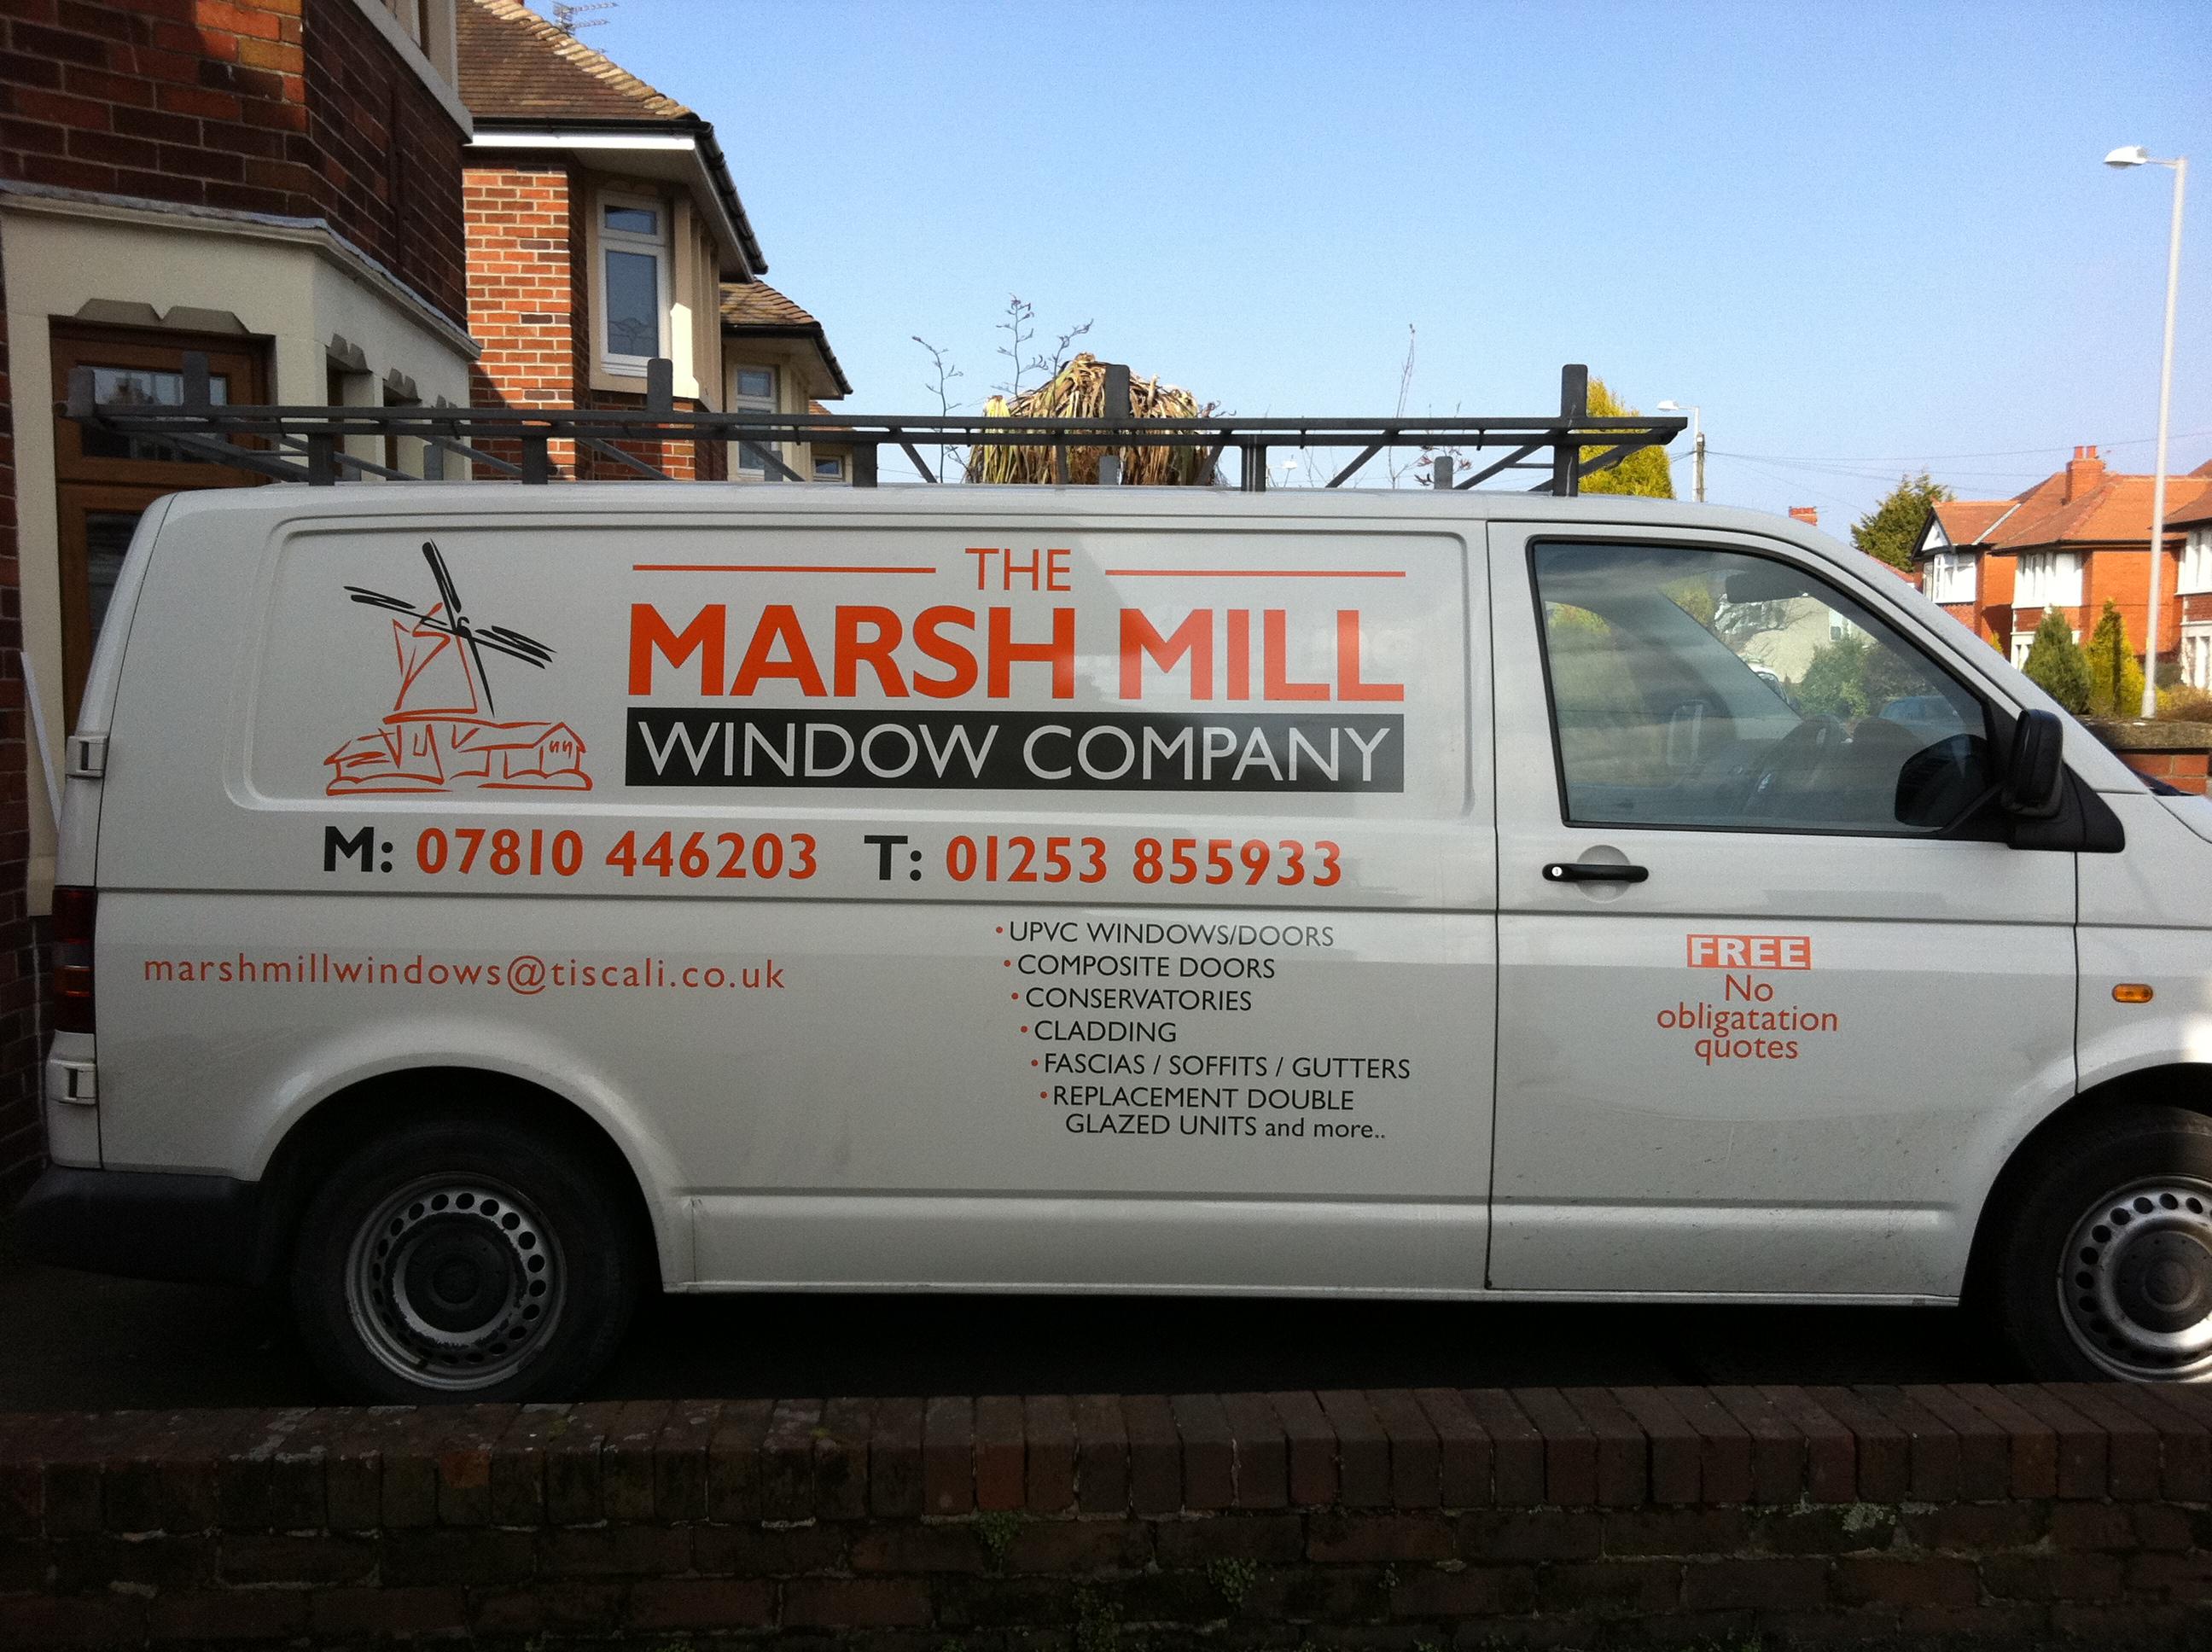 bc3fff6e8fc029 Van vinyl graphics for Marsh Mill Window Compnay.  Rob2018-05-15T13 15 20+01 00